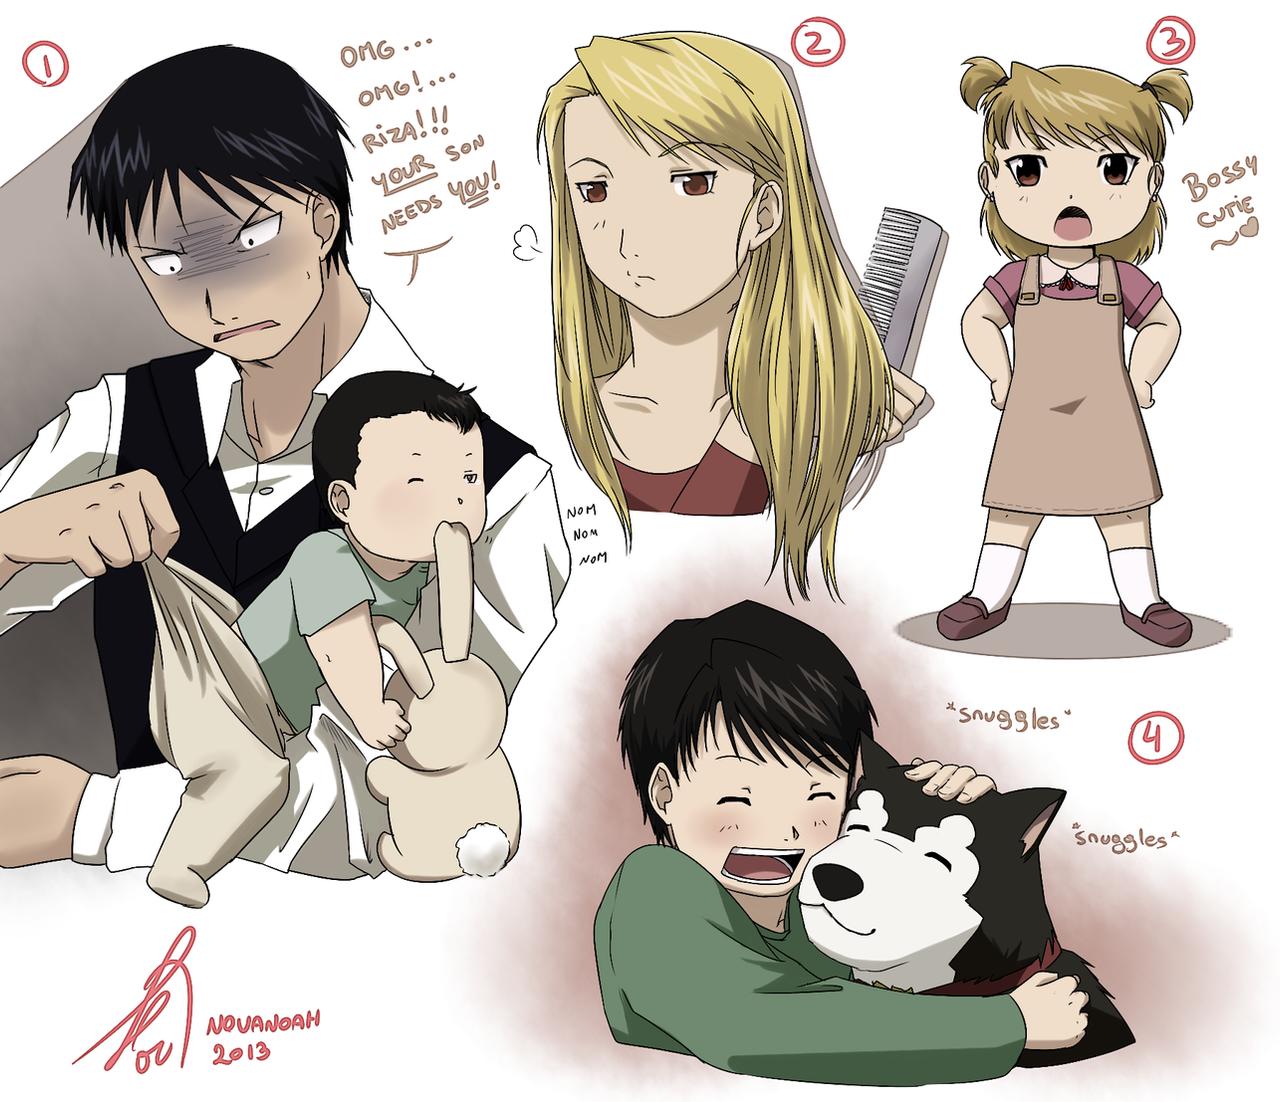 mustang_family_doodles_1_by_novanoah-d5x